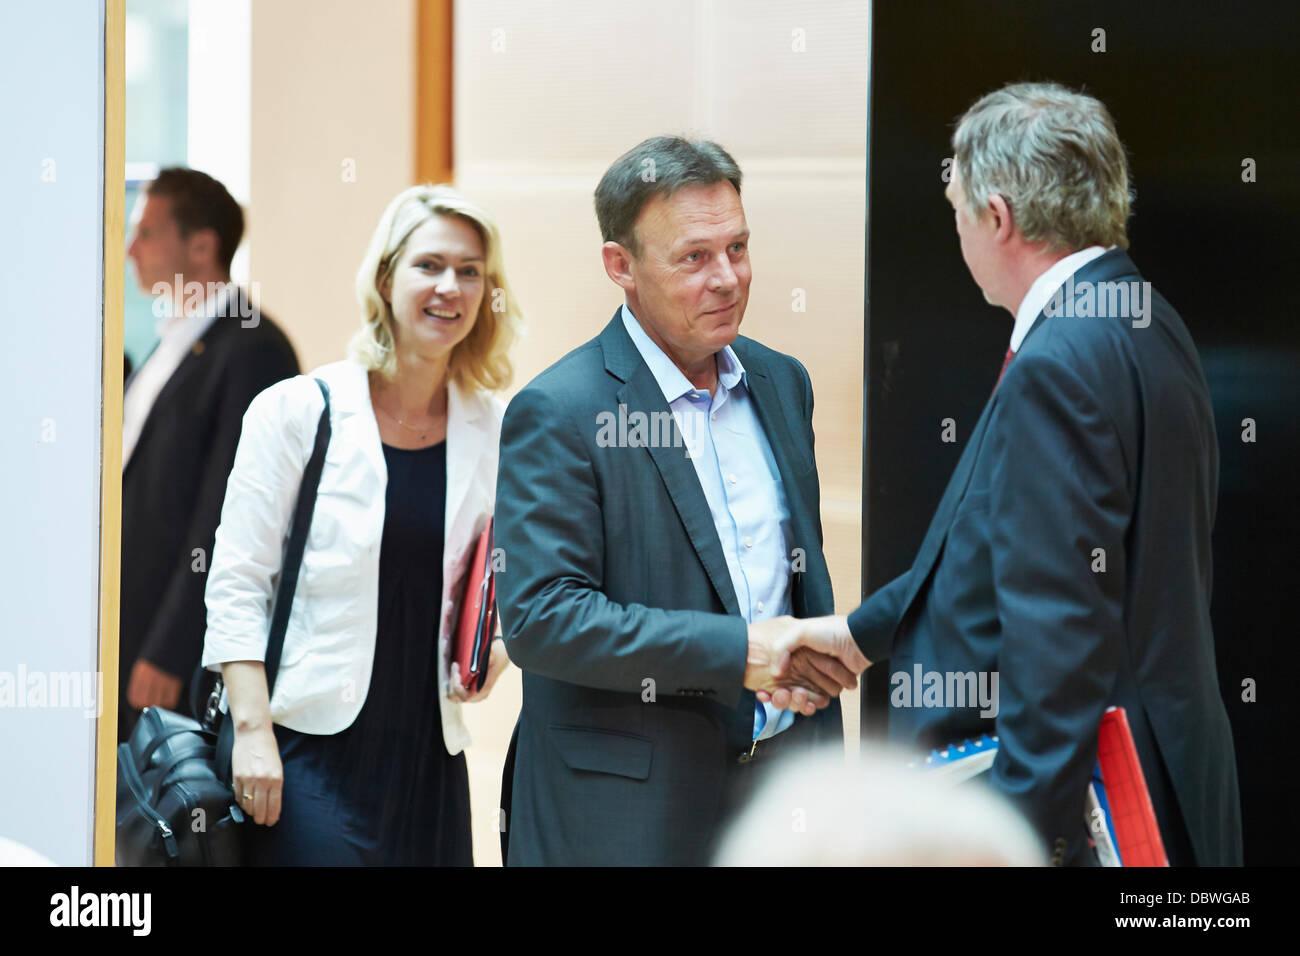 Berlin, German. 5th Aug, 2013. Thomas Oppermann, Secretary of the SPD Parliamentary Group, and Manuela Schwesig - Stock Image